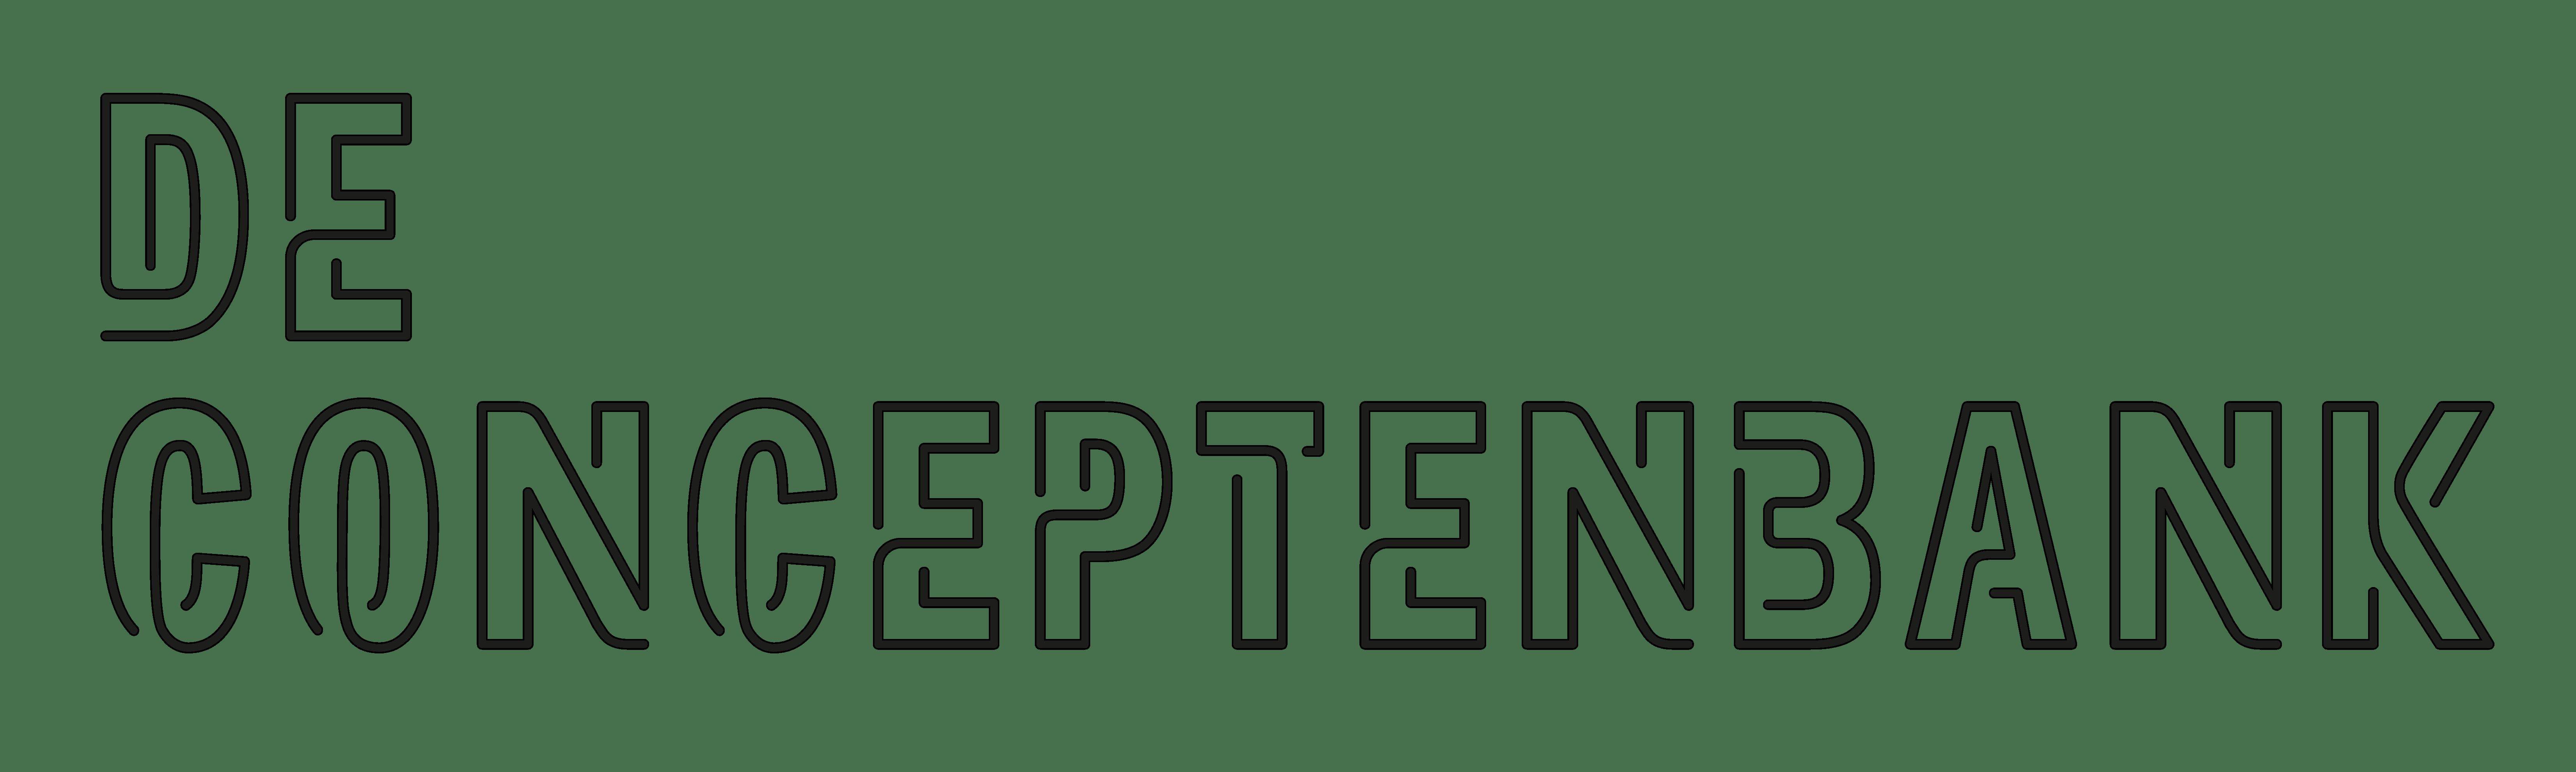 deconceptenbank